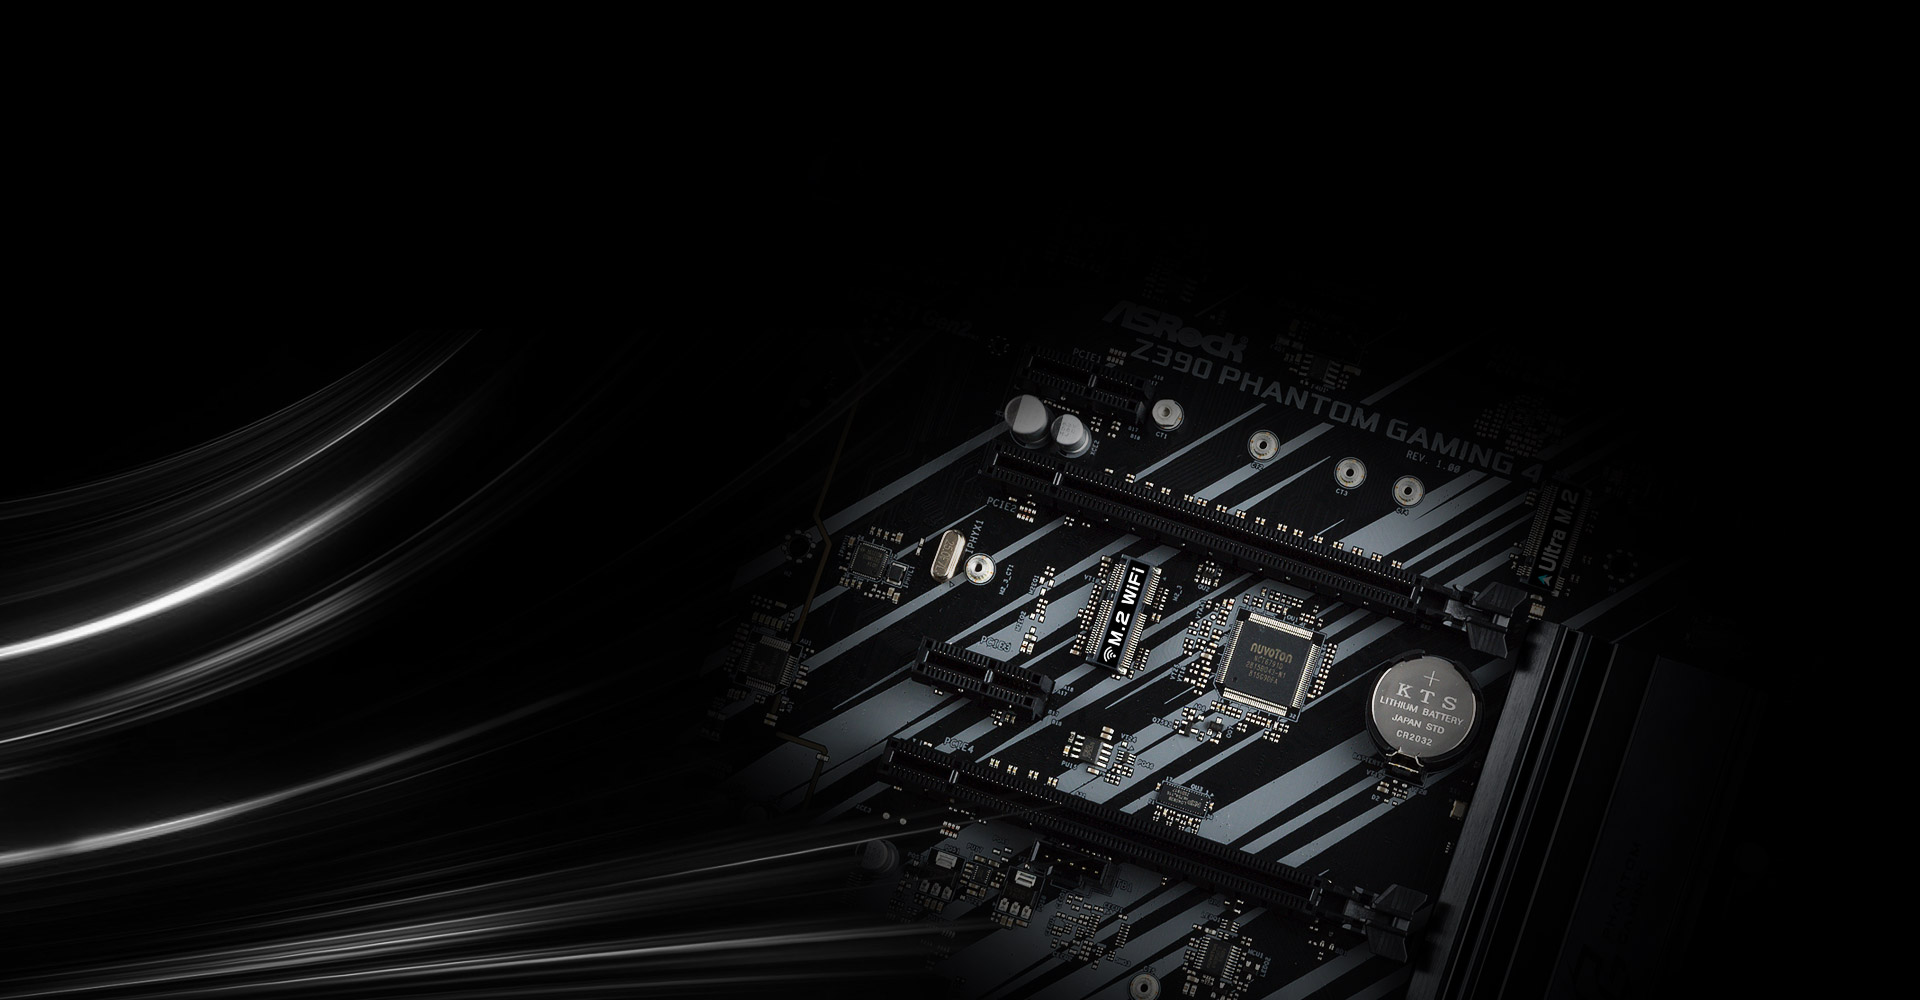 ASRock Z390 Phantom Gaming 4 LGA 1151 (300 Series) Intel Z390 SATA 6Gb/s  ATX Intel Motherboard - Newegg com